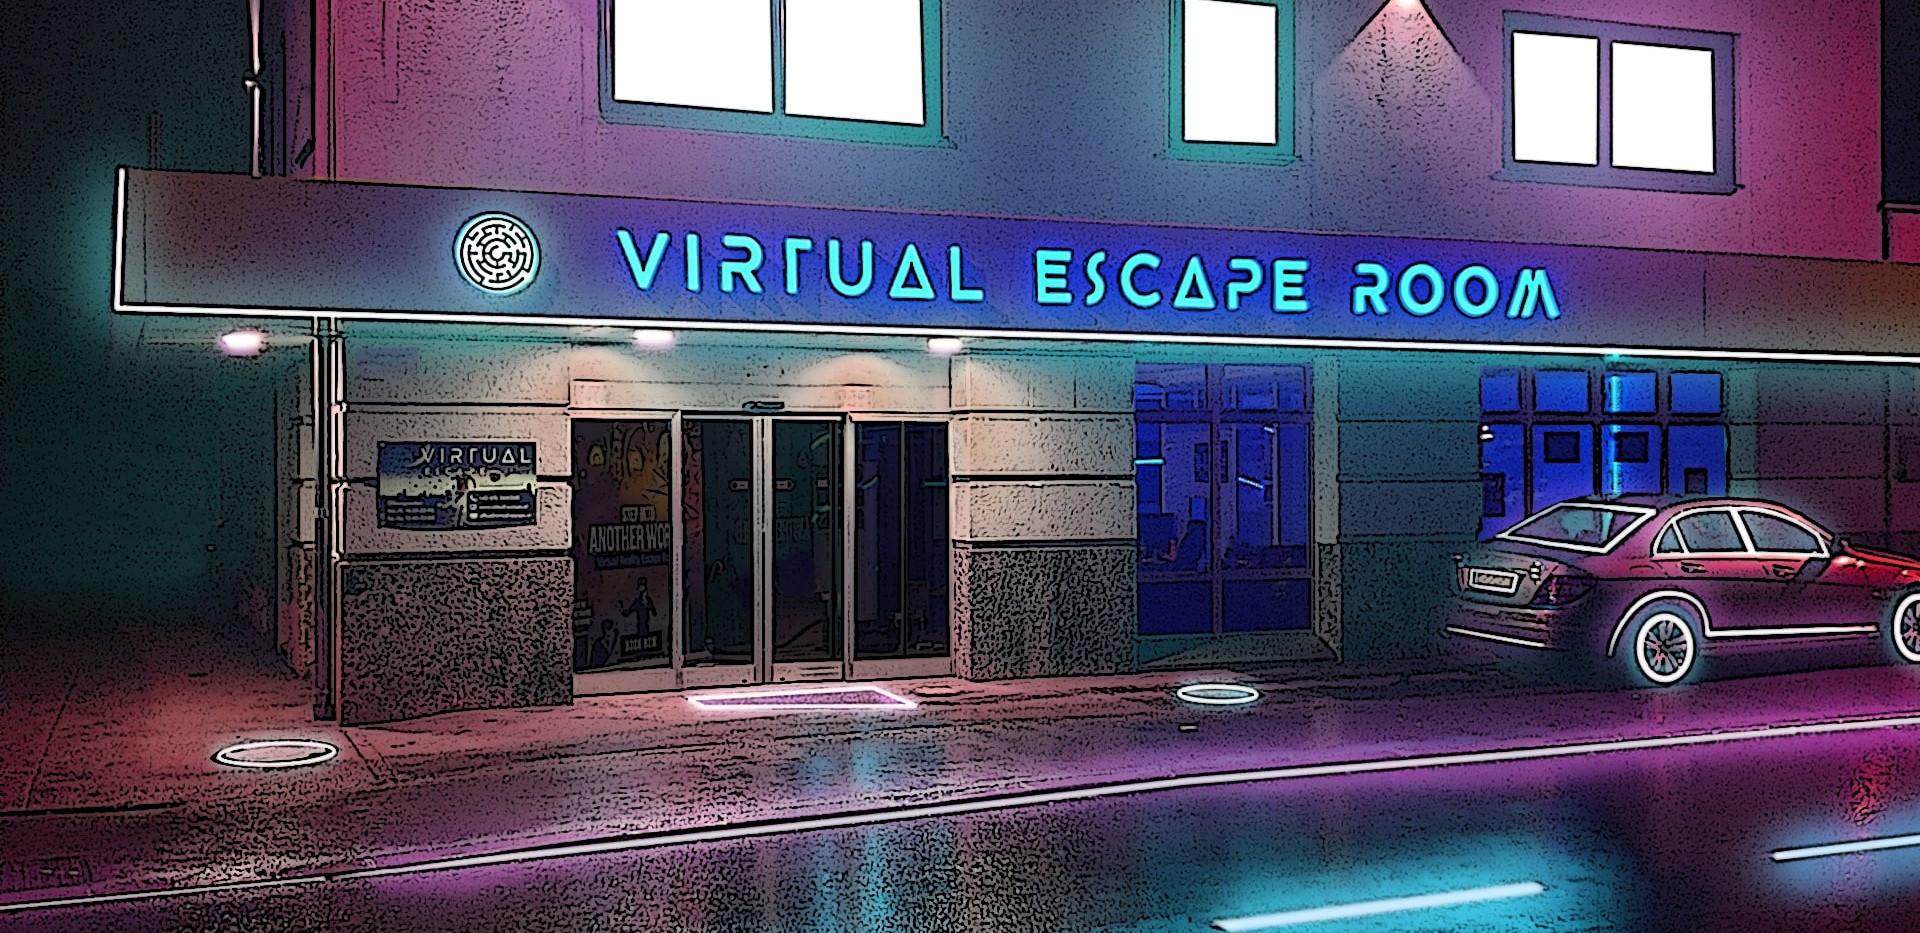 Eingang   Cyberpunk Online Escape Game  